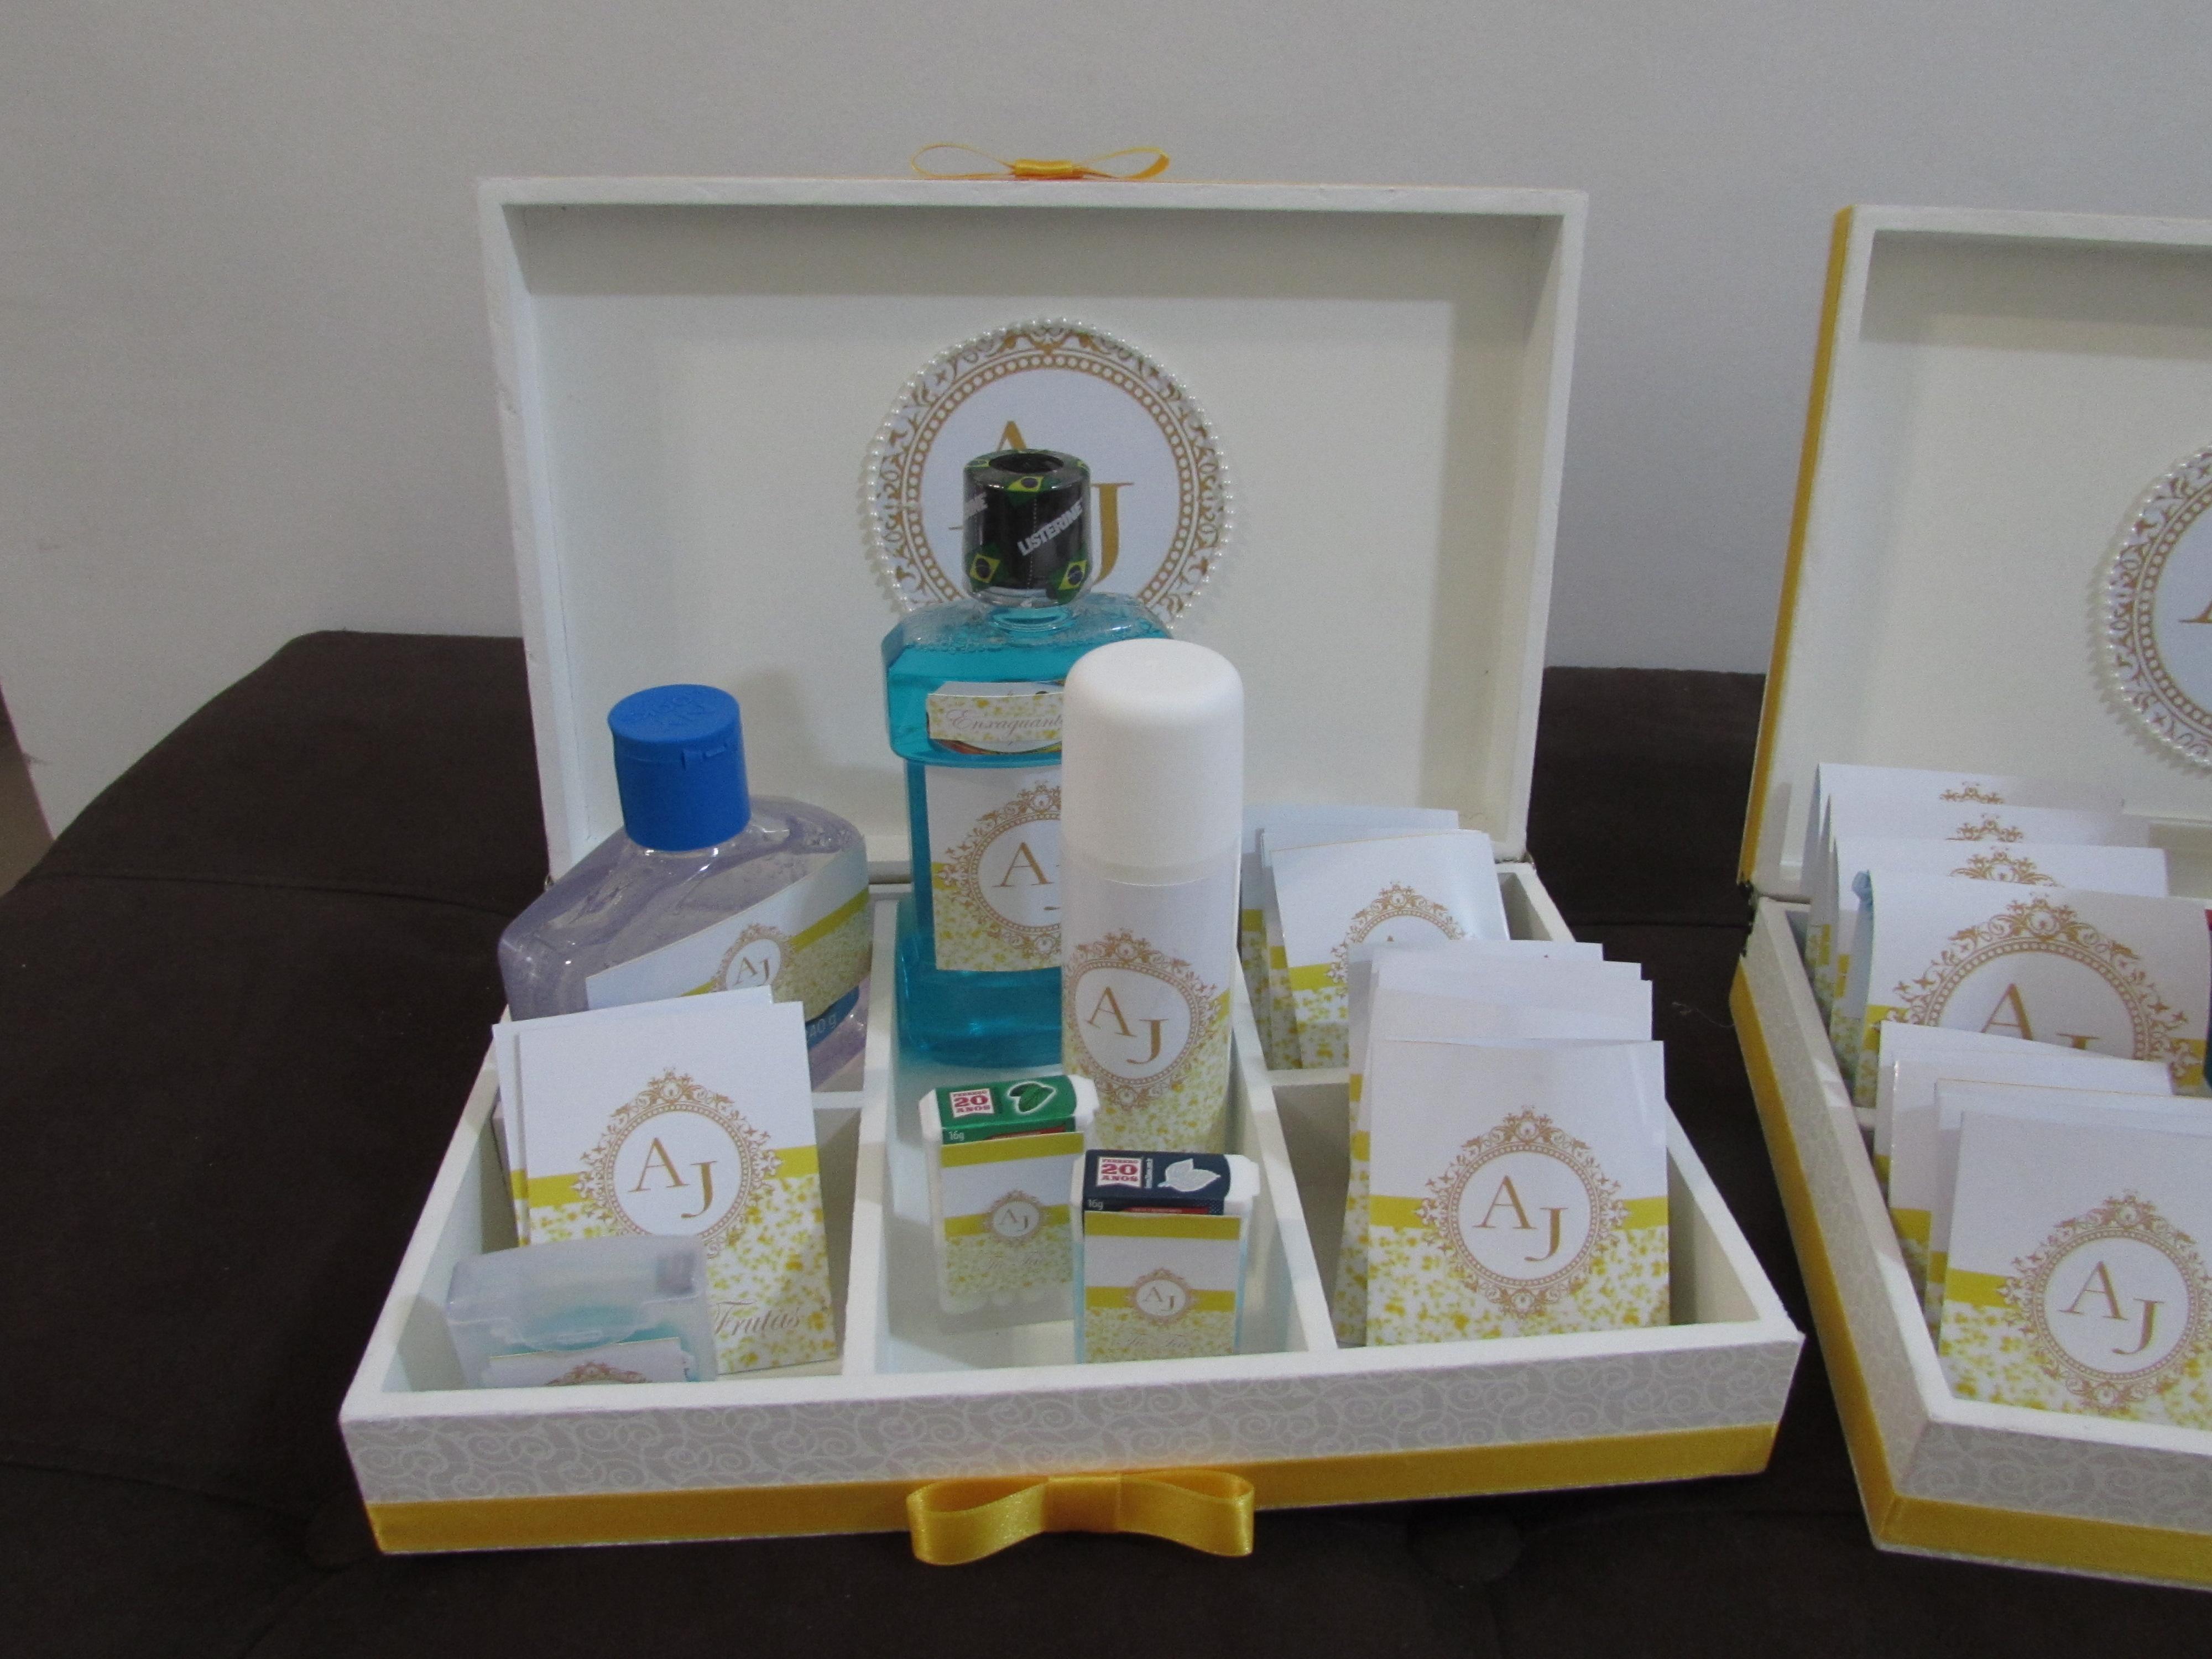 Kit Toalete Azul Tiffany Rotulos Listas Kit Azul Tiffanyjpg Car  #15466B 4000 3000